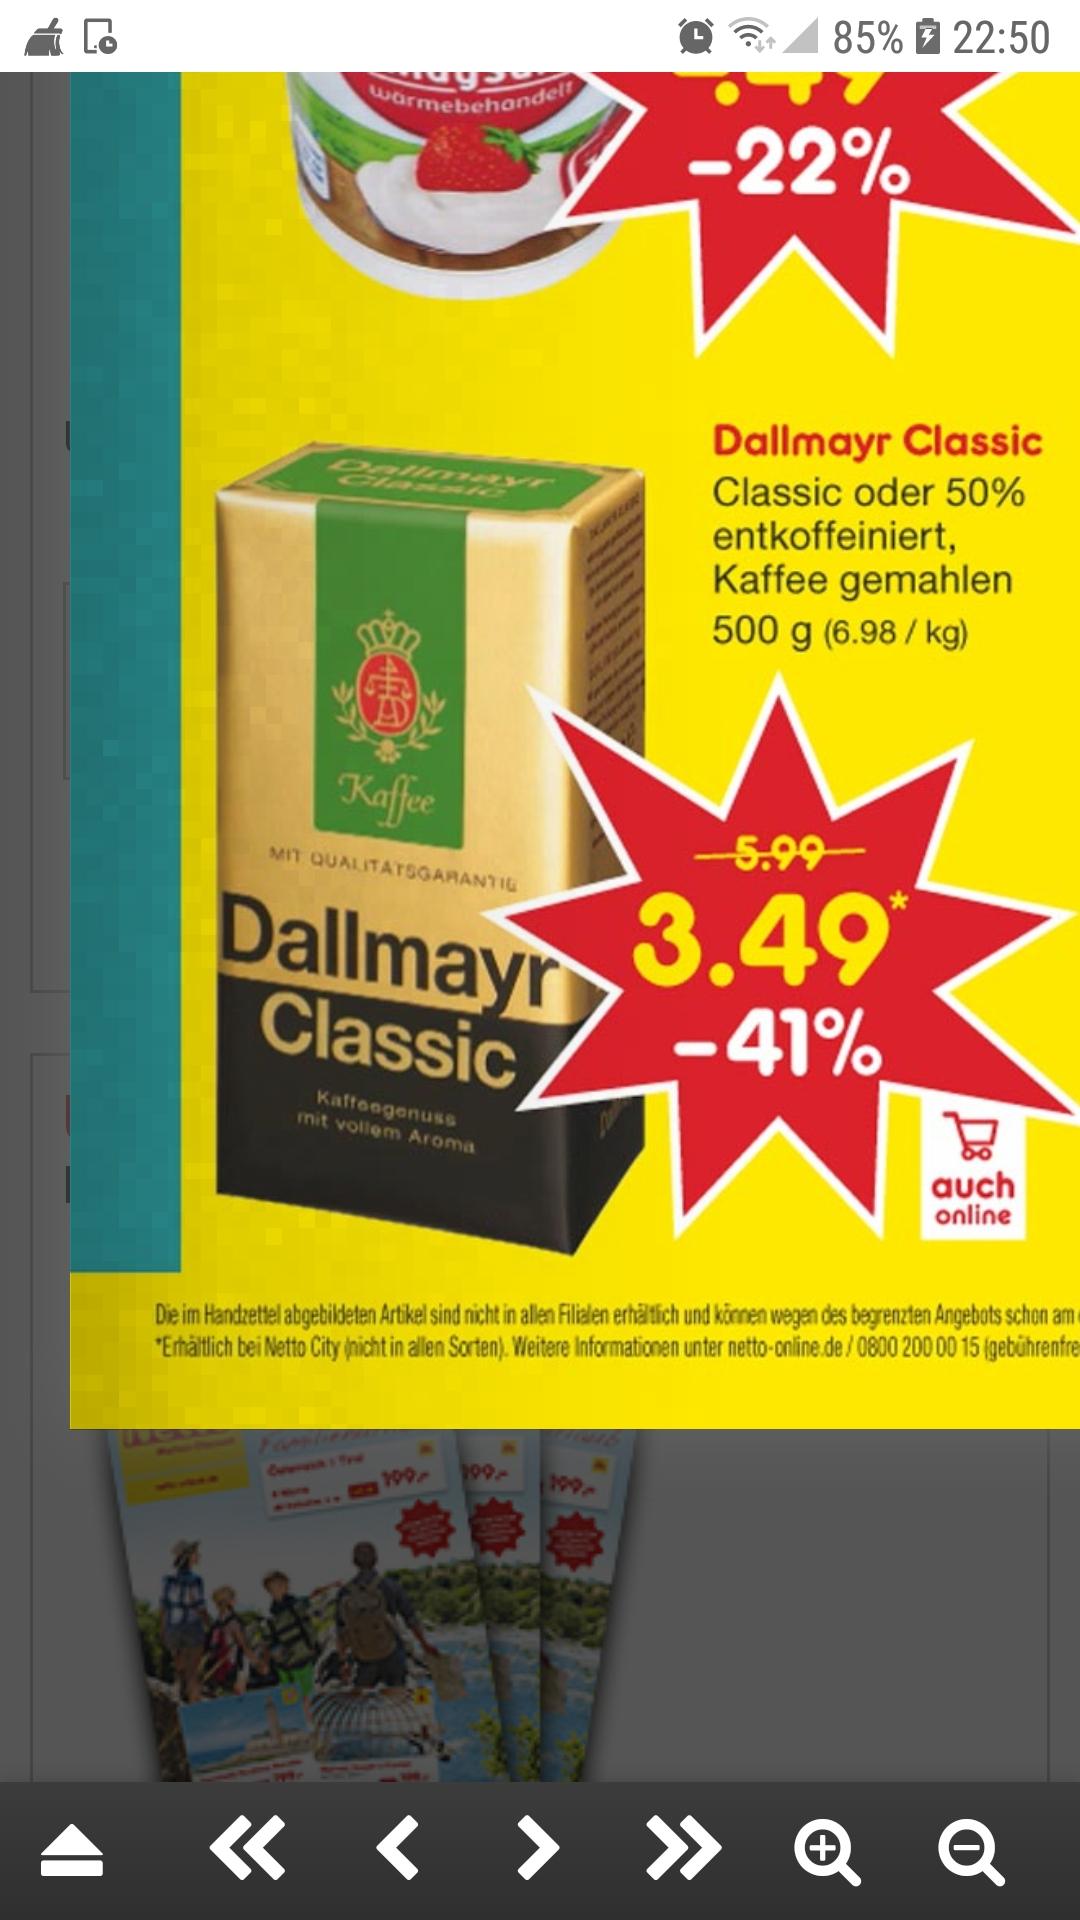 Dallmayer Classic oder 50 % entkoffeiniert 41% reduziert bei Netto